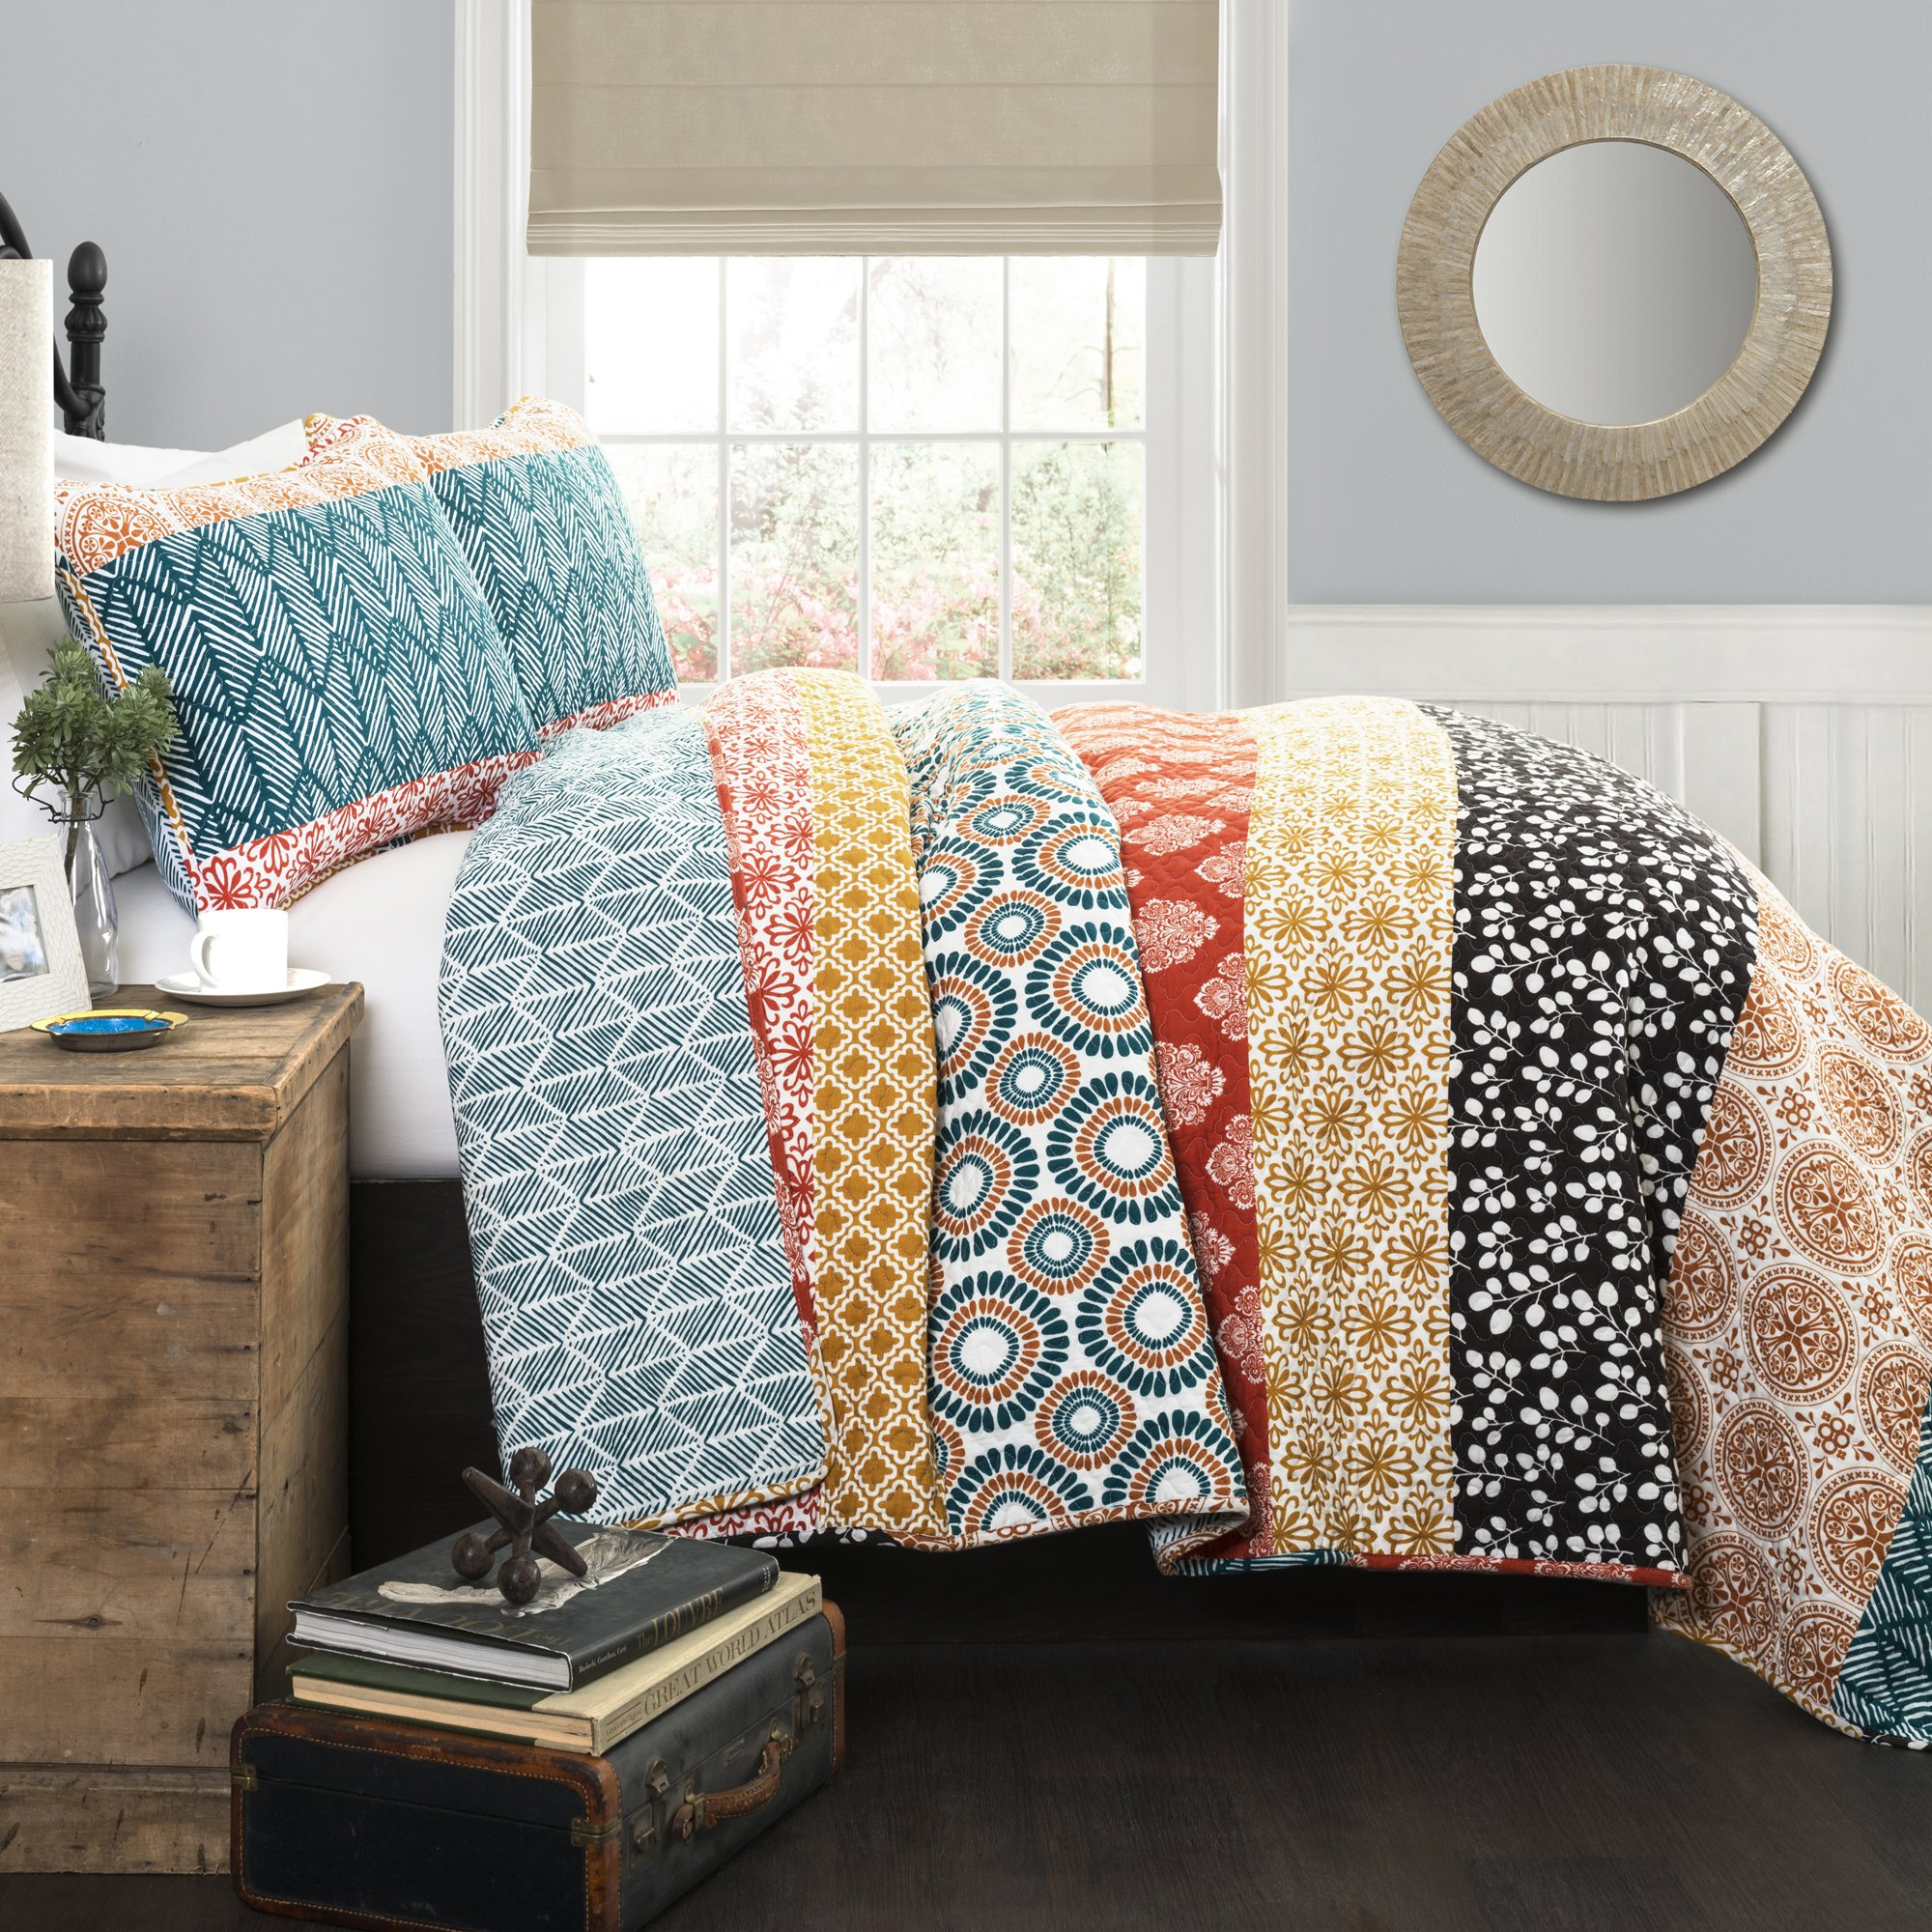 Lush Decor 3 Piece Bohemian Stripe Quilt Set, Full/Queen, Turquoise